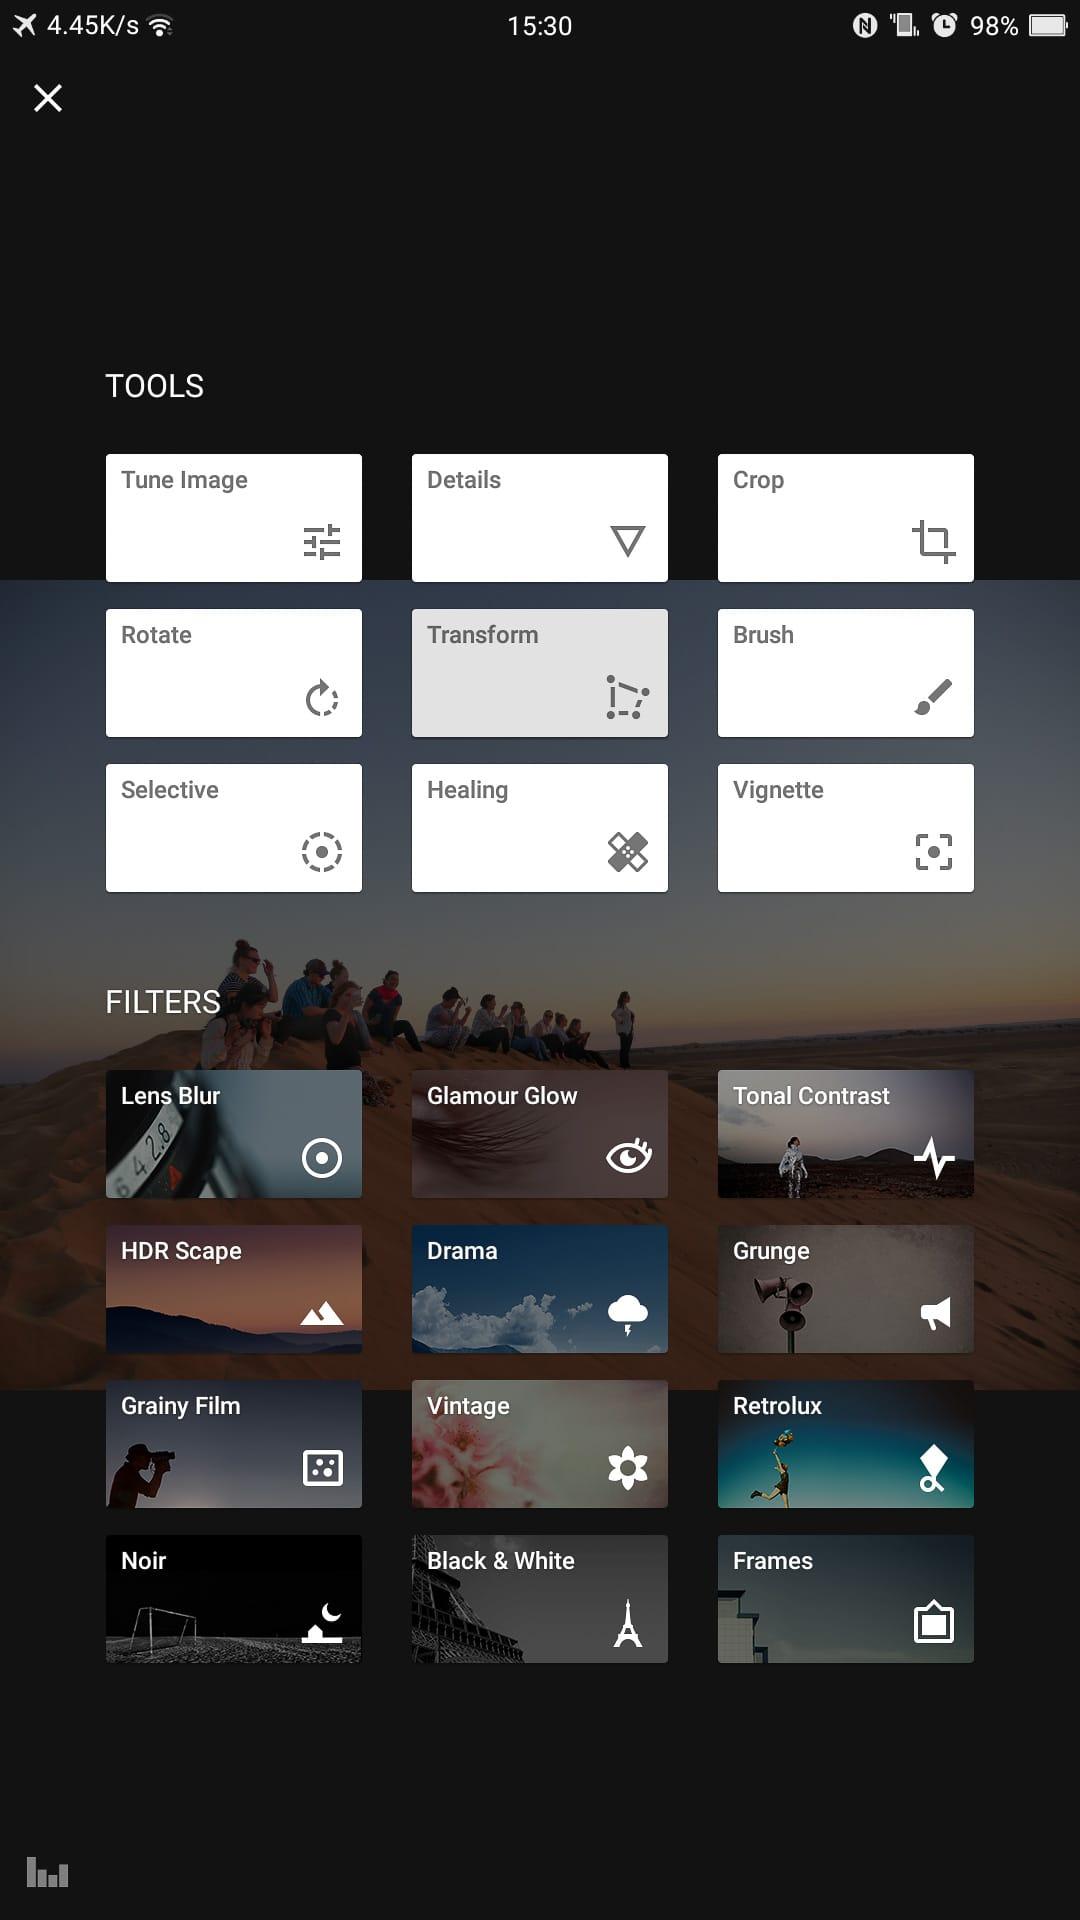 Snapseed main tool window options